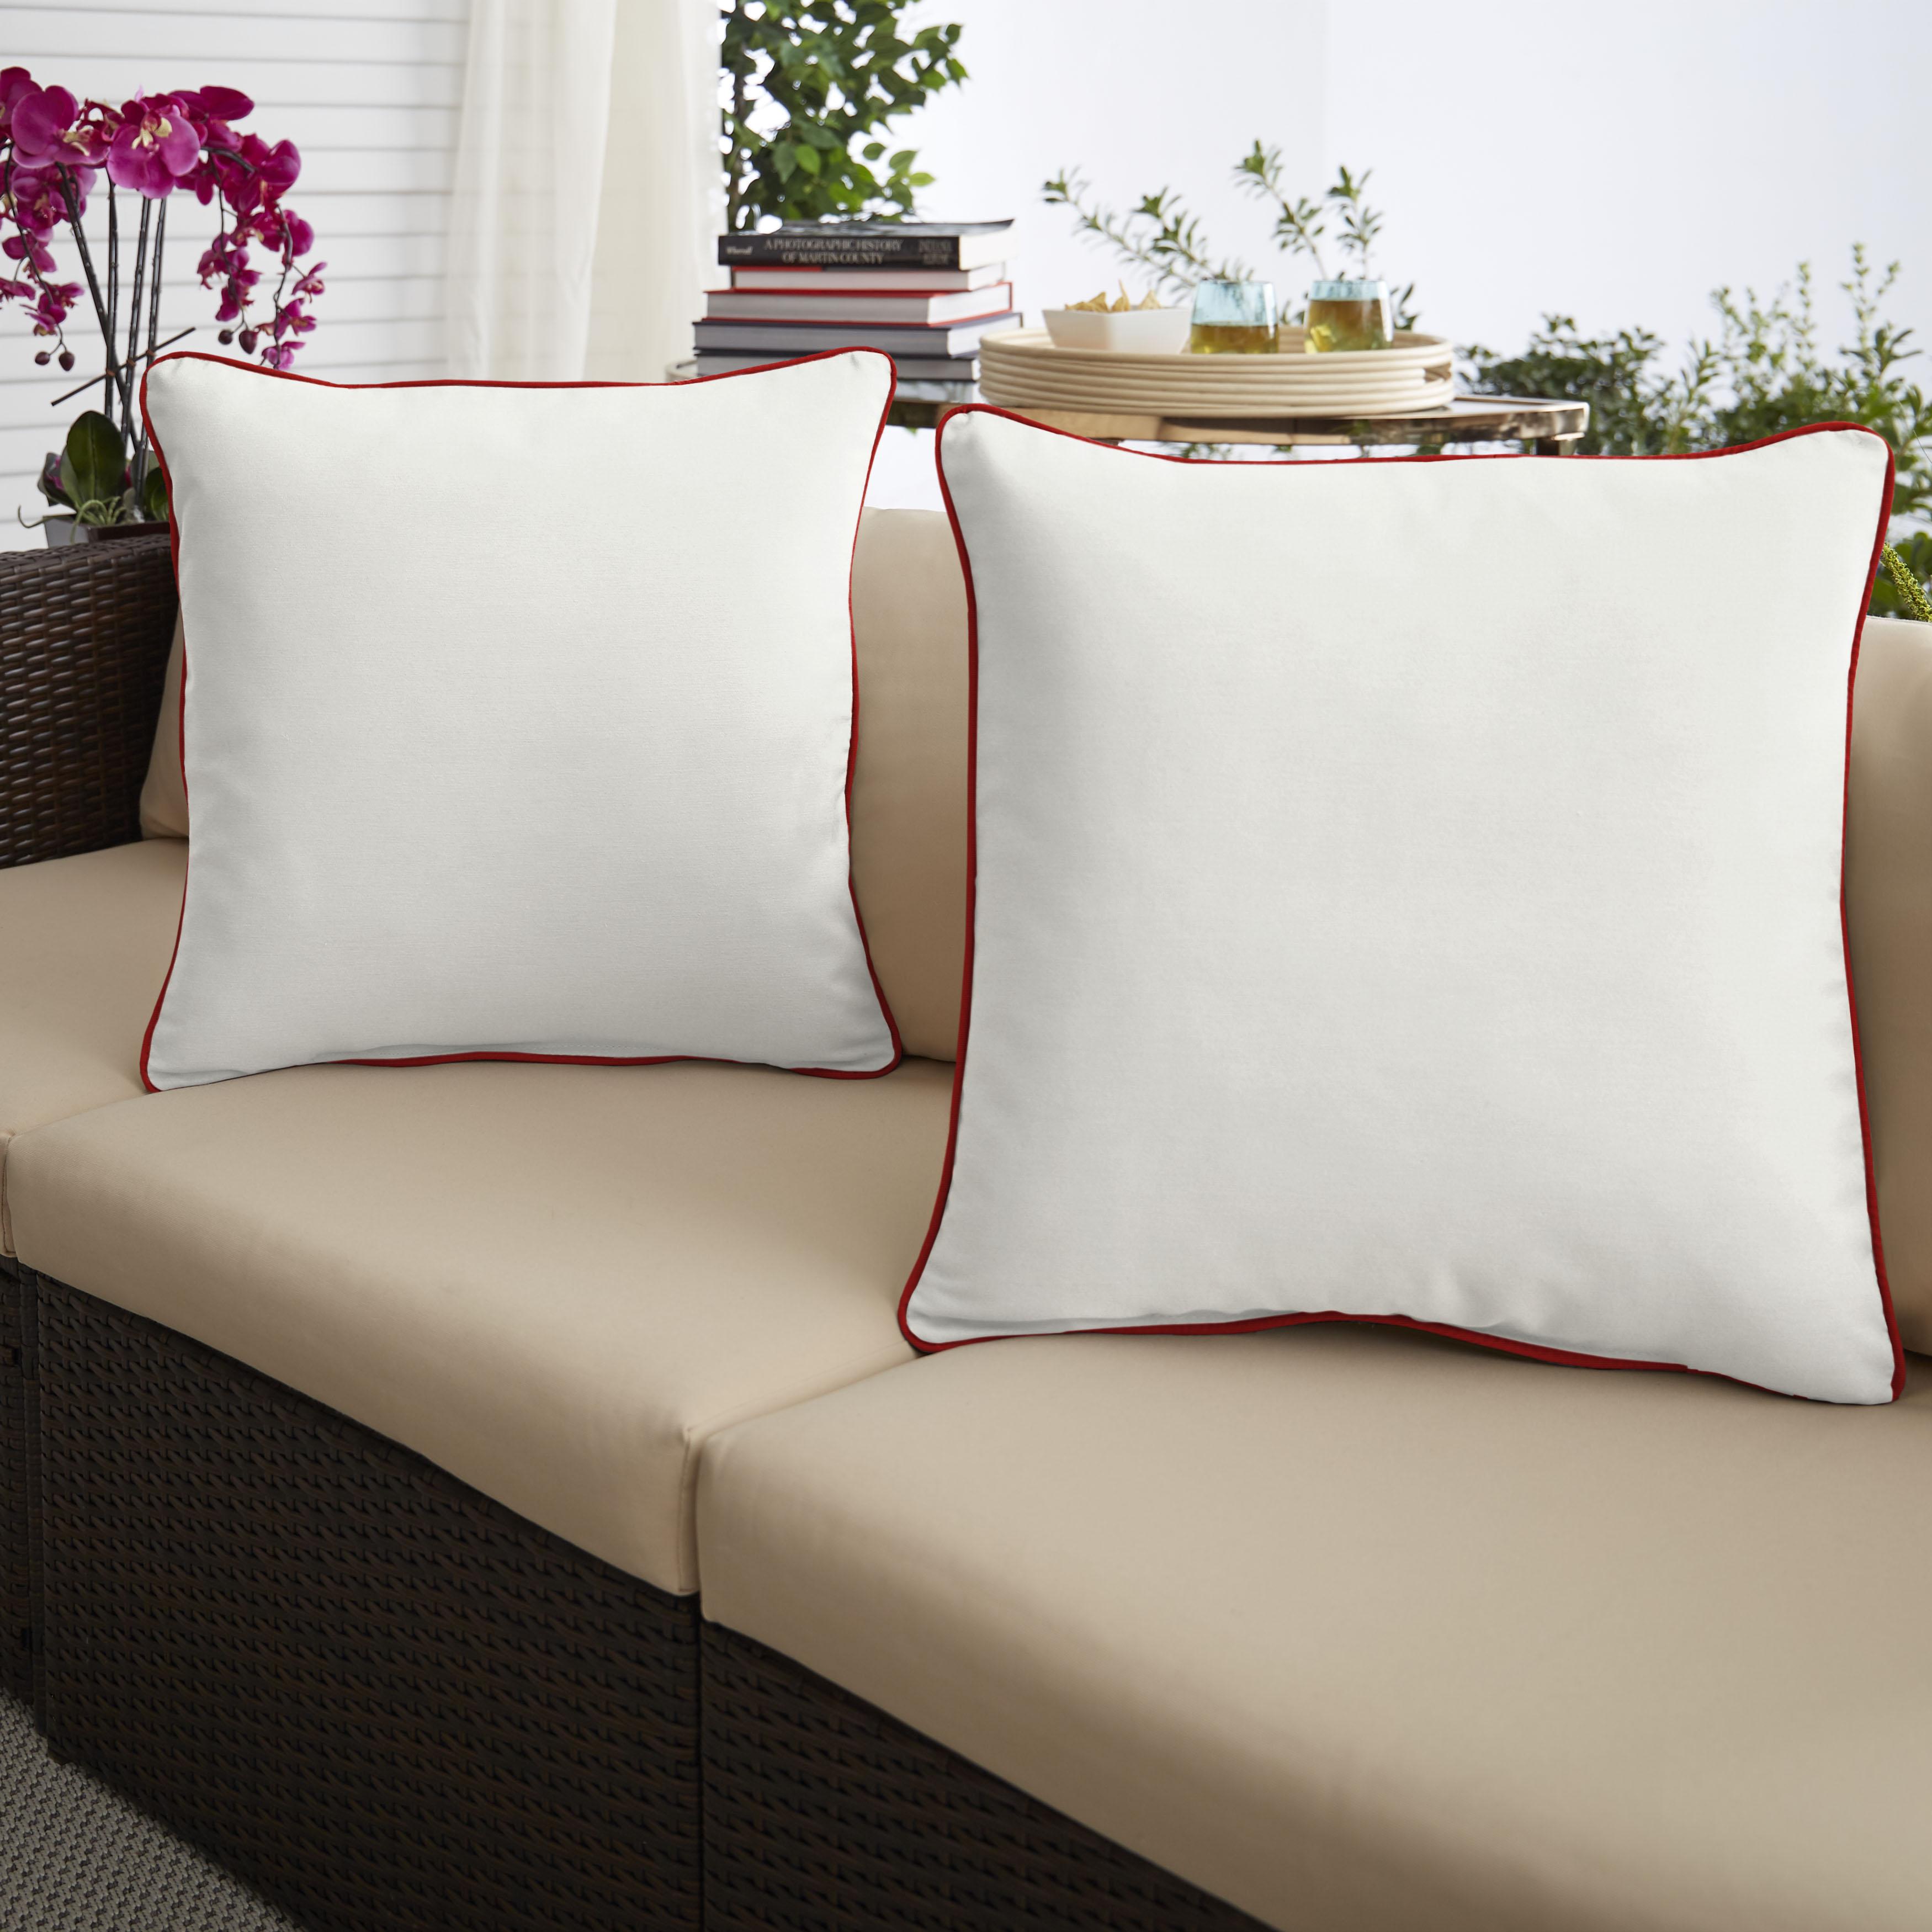 Sunbrella Canvas Natural/Canvas Jockey Red Set of 2 Outdoor Pillows